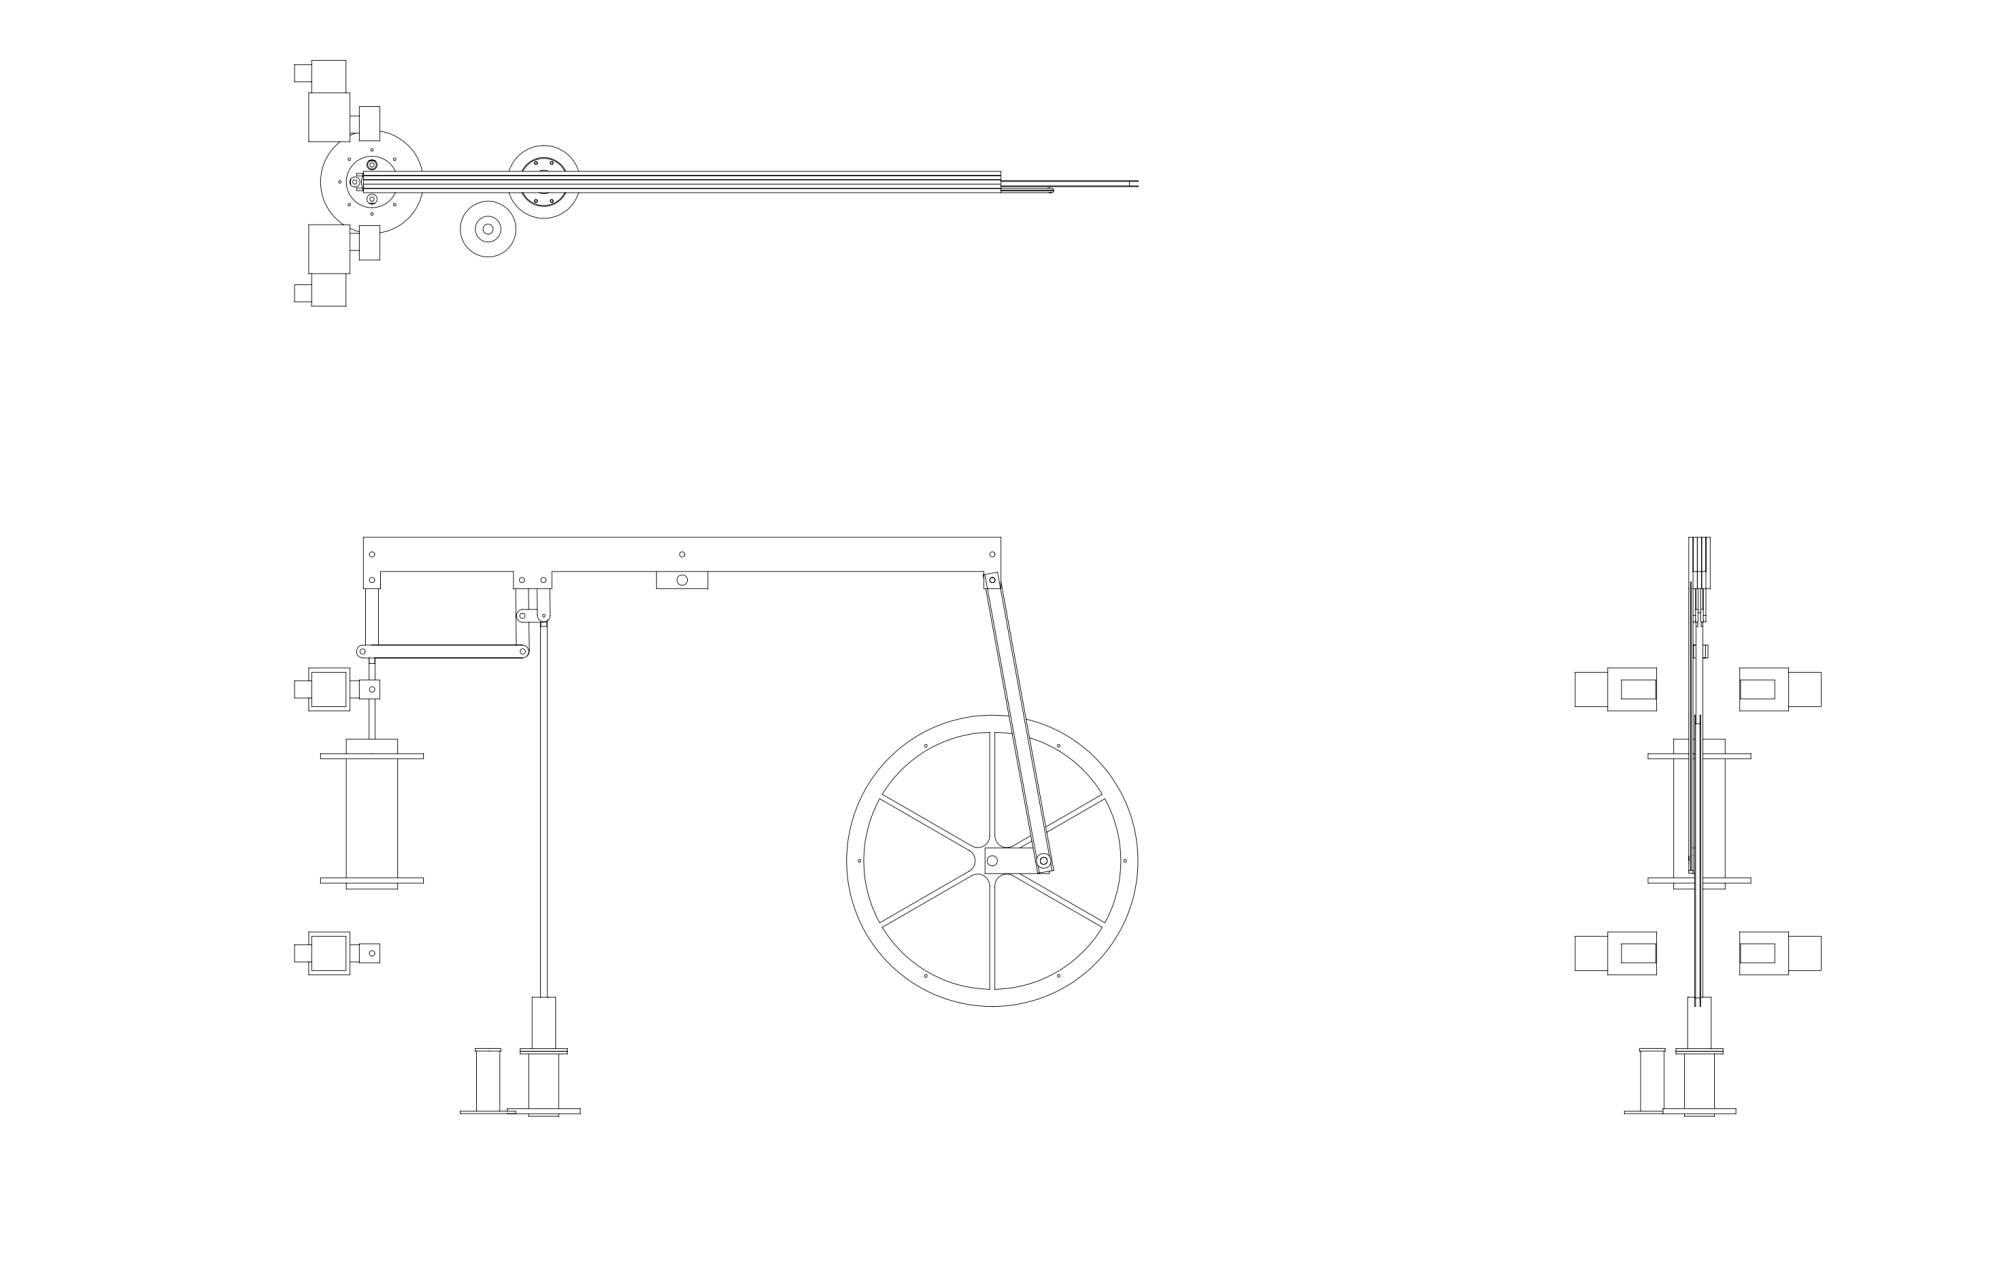 Condensing Steam Engine – Diagram Of Condensing Steam Engine